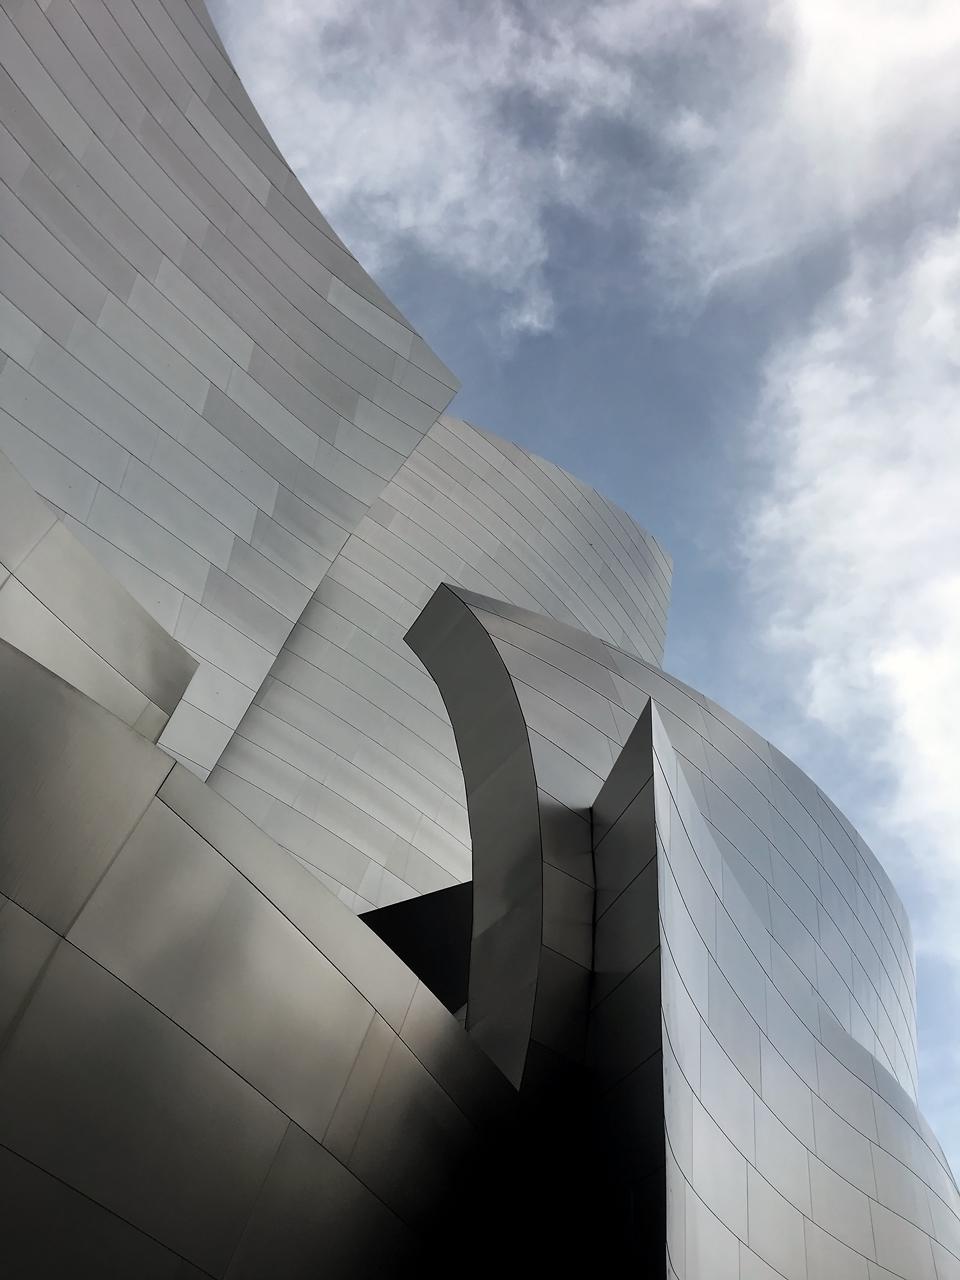 steel cladding detail / facade